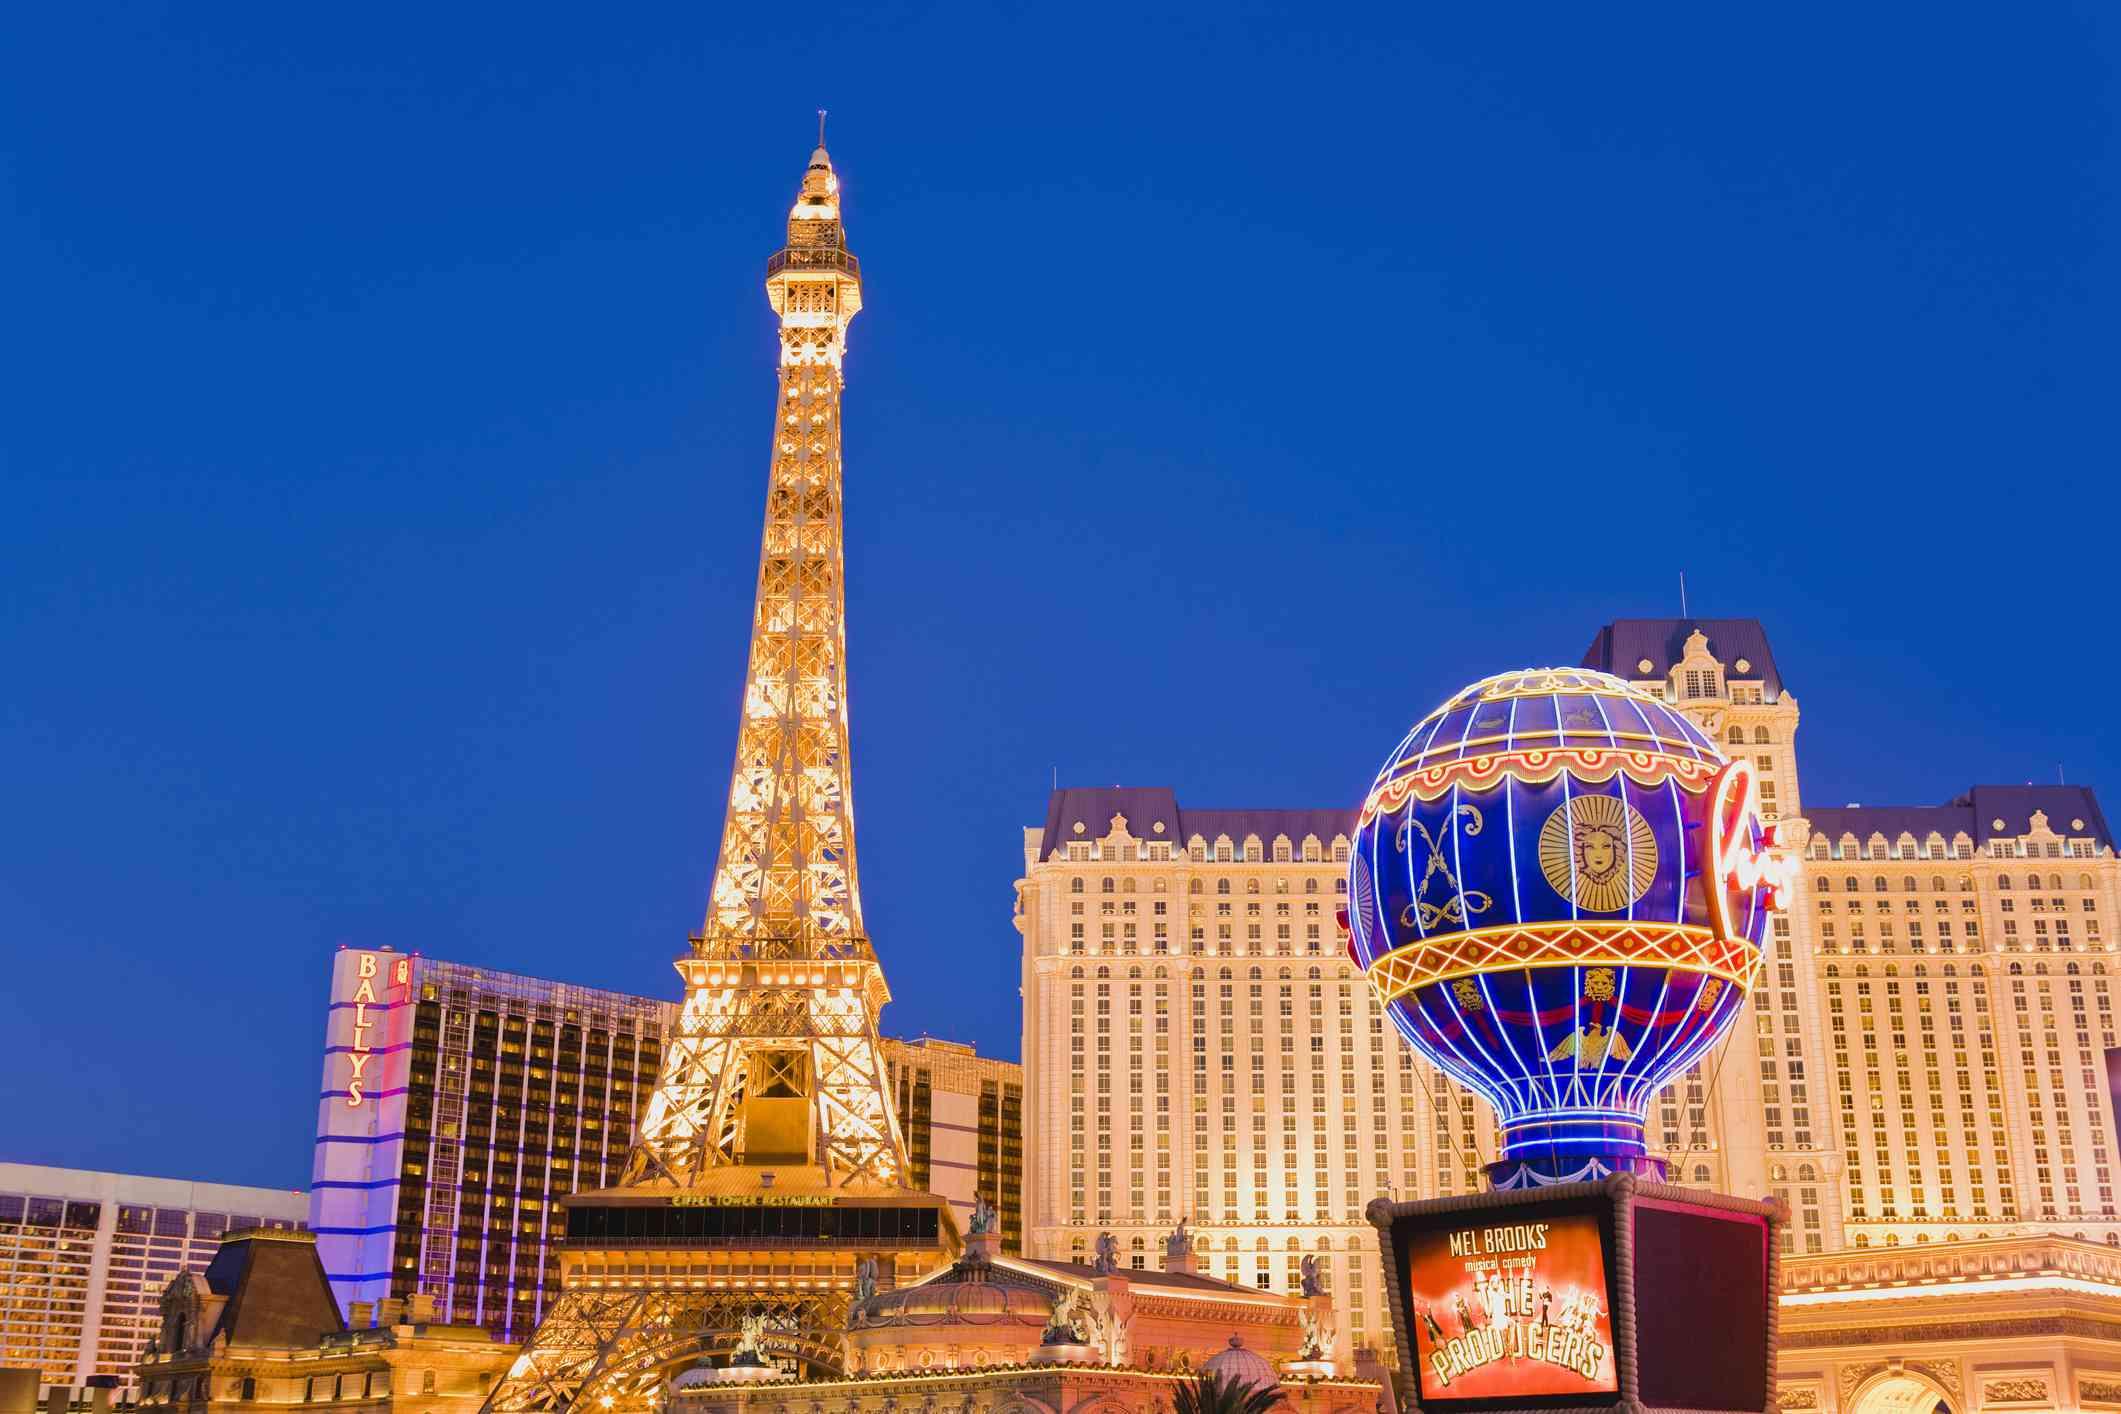 Eiffel Tower Replica and Paris Hotel